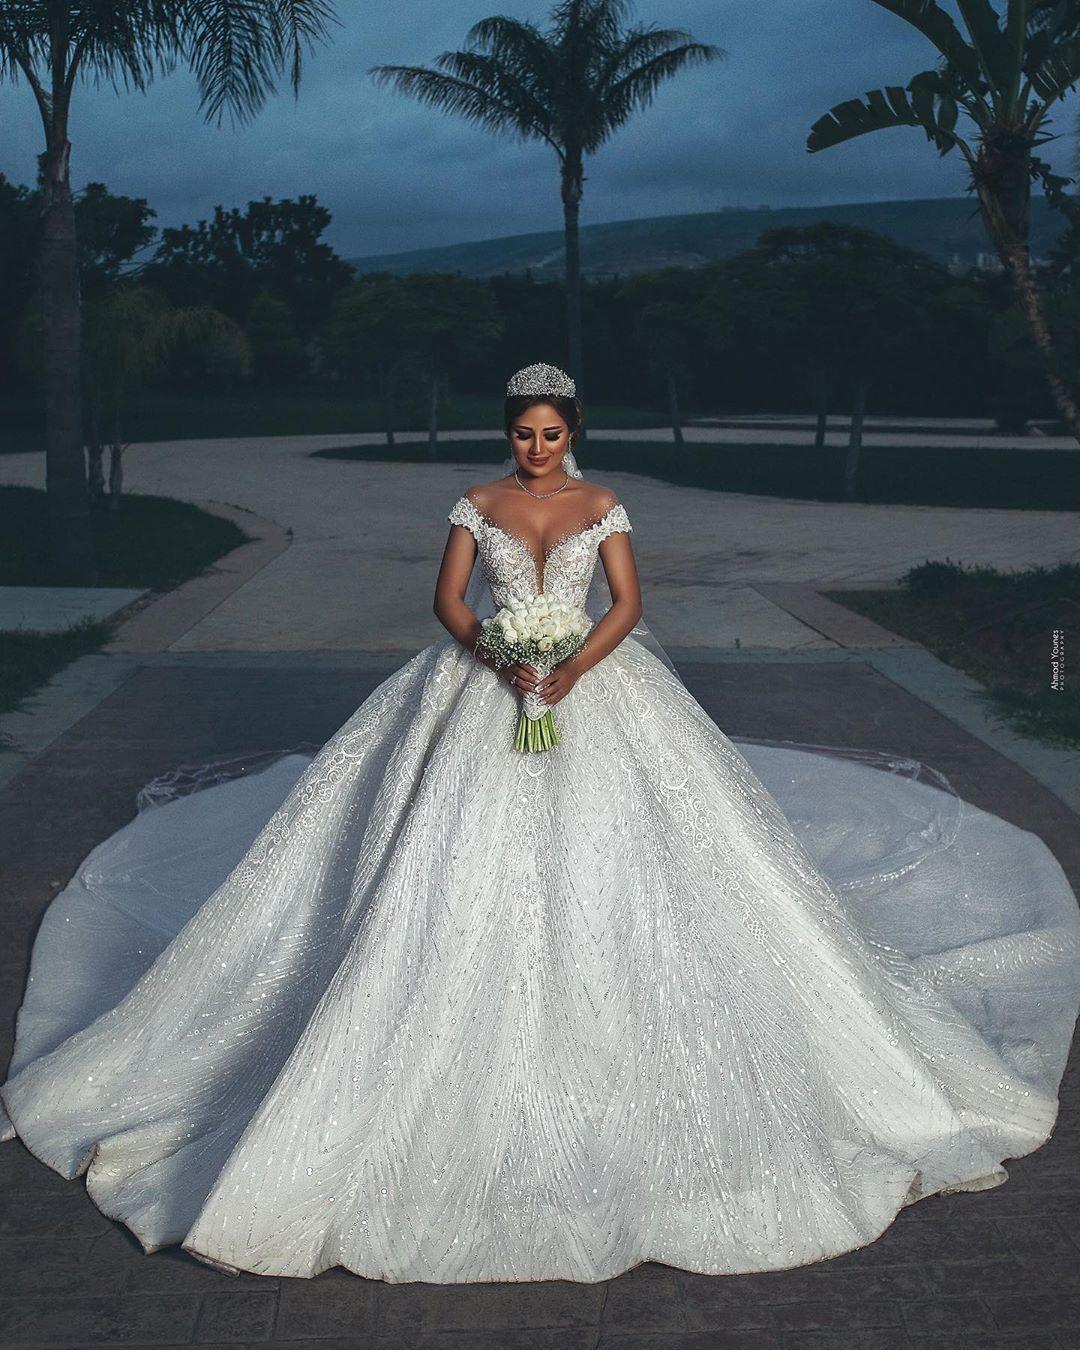 فساتين زفاف اوف شولدر Wedding Dresses Dream Wedding Dresses Tulle Dress Diy